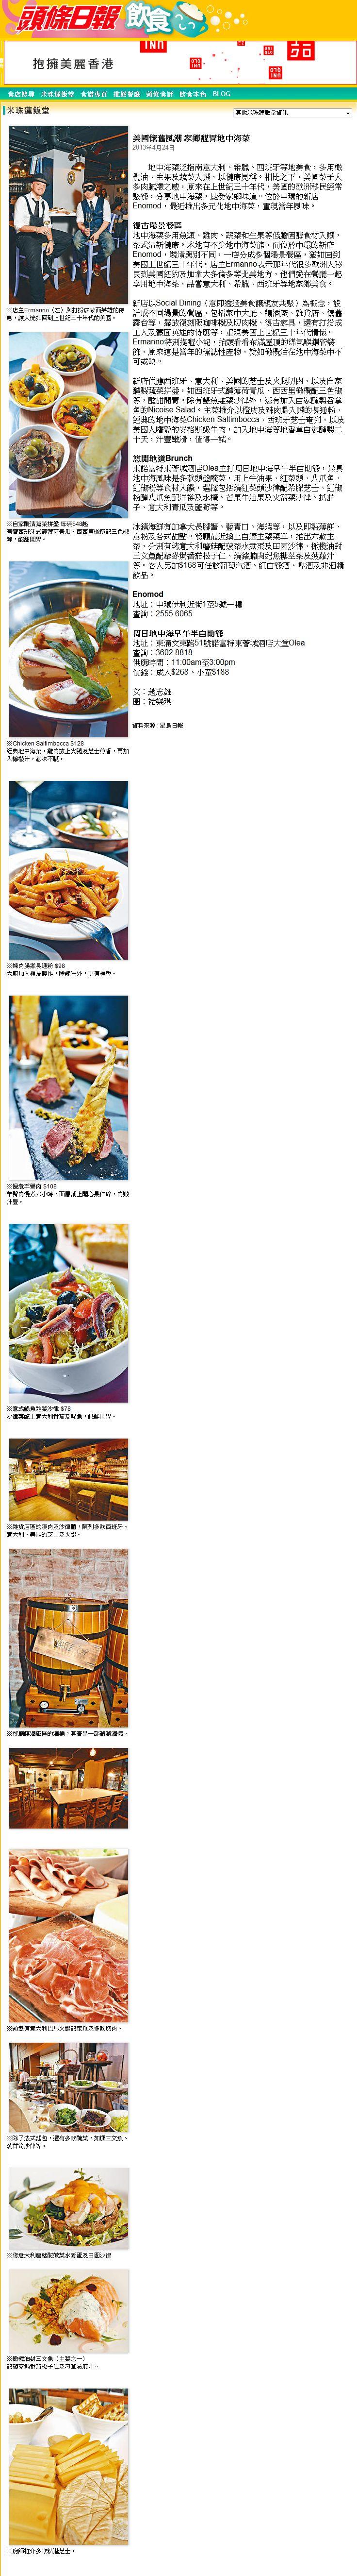 ENOMOD - 24.04 - Headline Daily (online).jpg